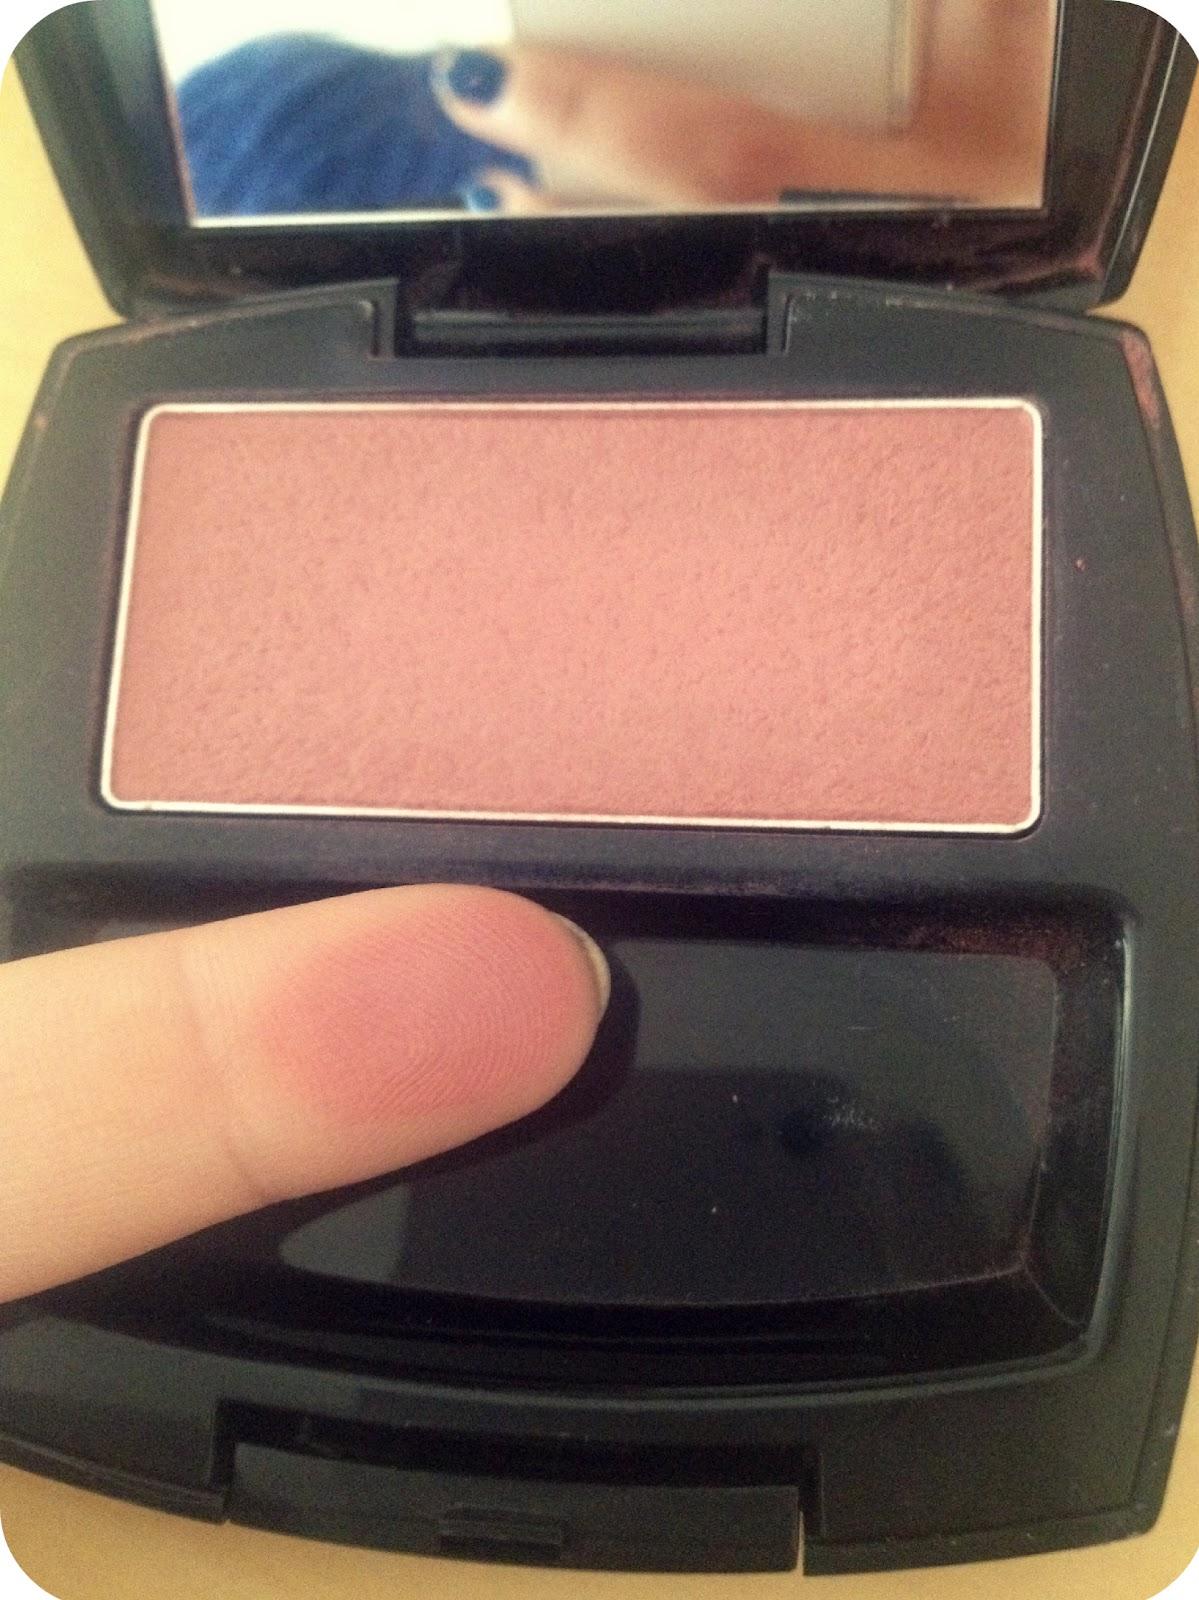 Jadelouise: Avon blush comparison